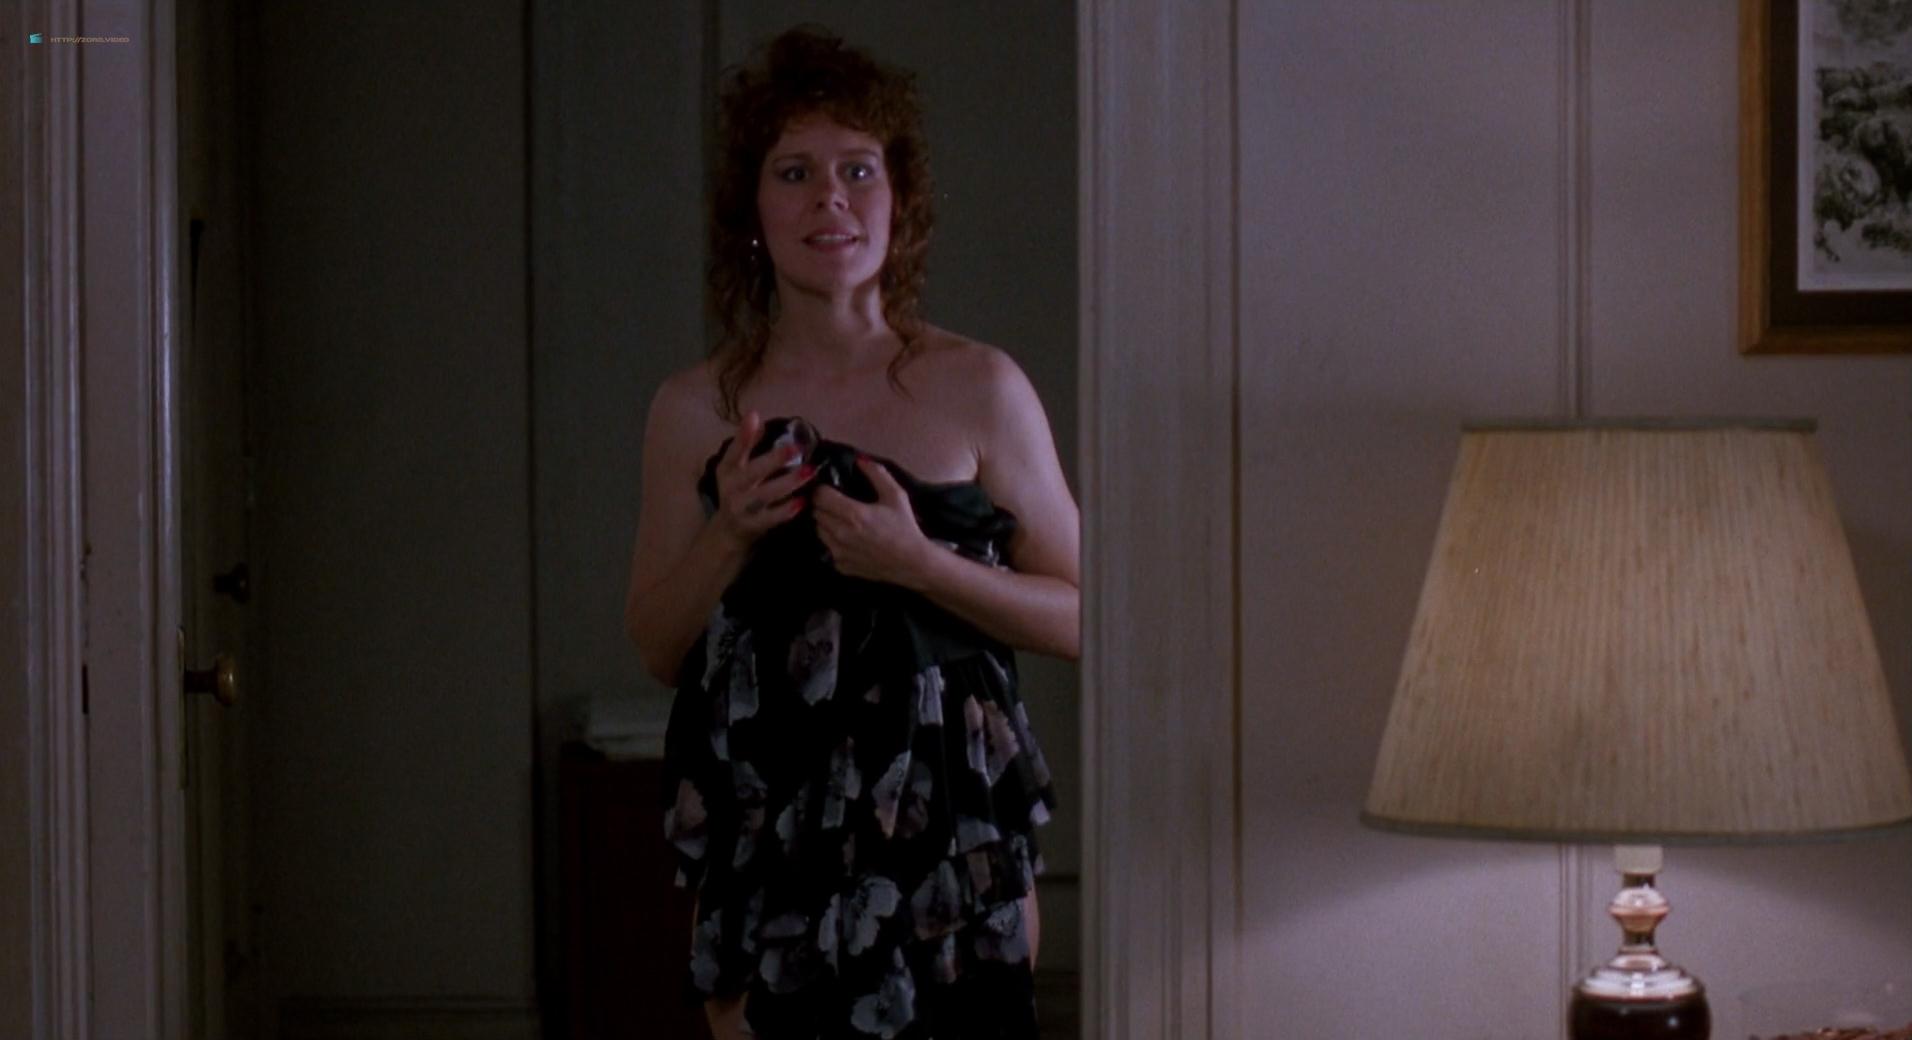 Ellen Barkin nude boobs and butt - Sea of Love (1989) HD 1080p BluRay (6)